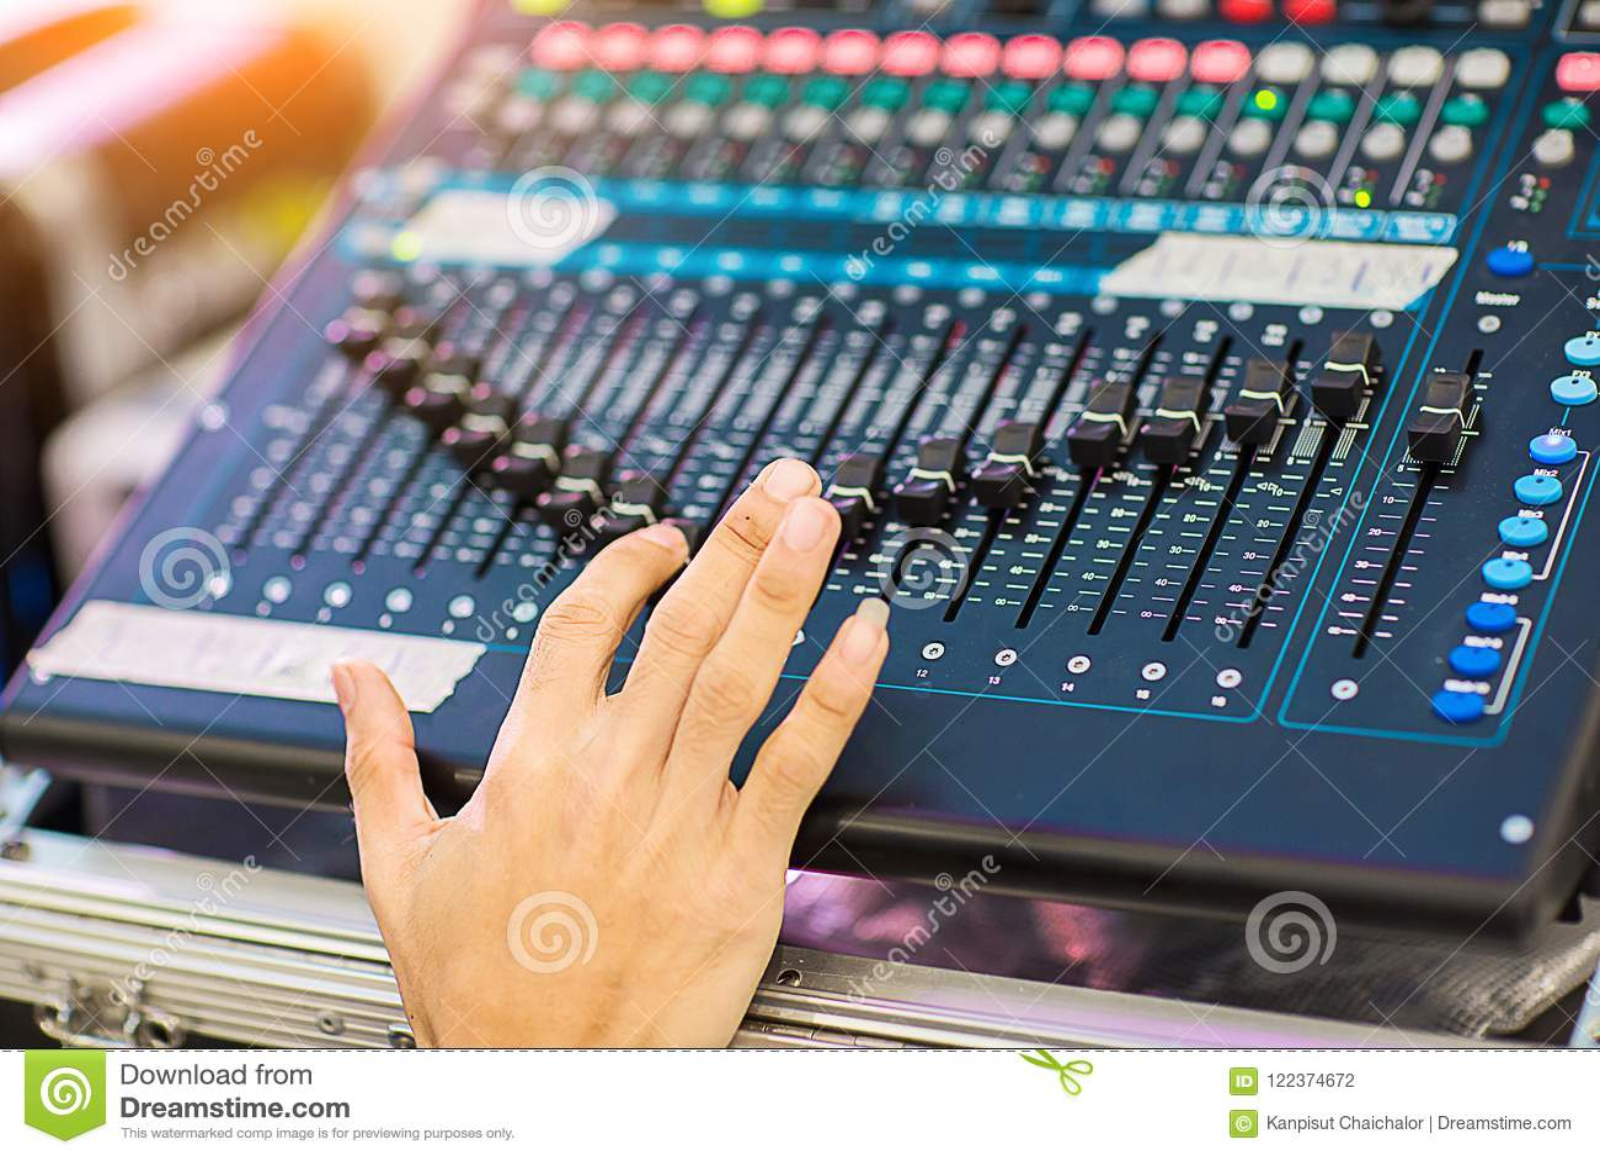 Blur Photo Hand Adjusting Audio Mixer  Sound Engineer Hands